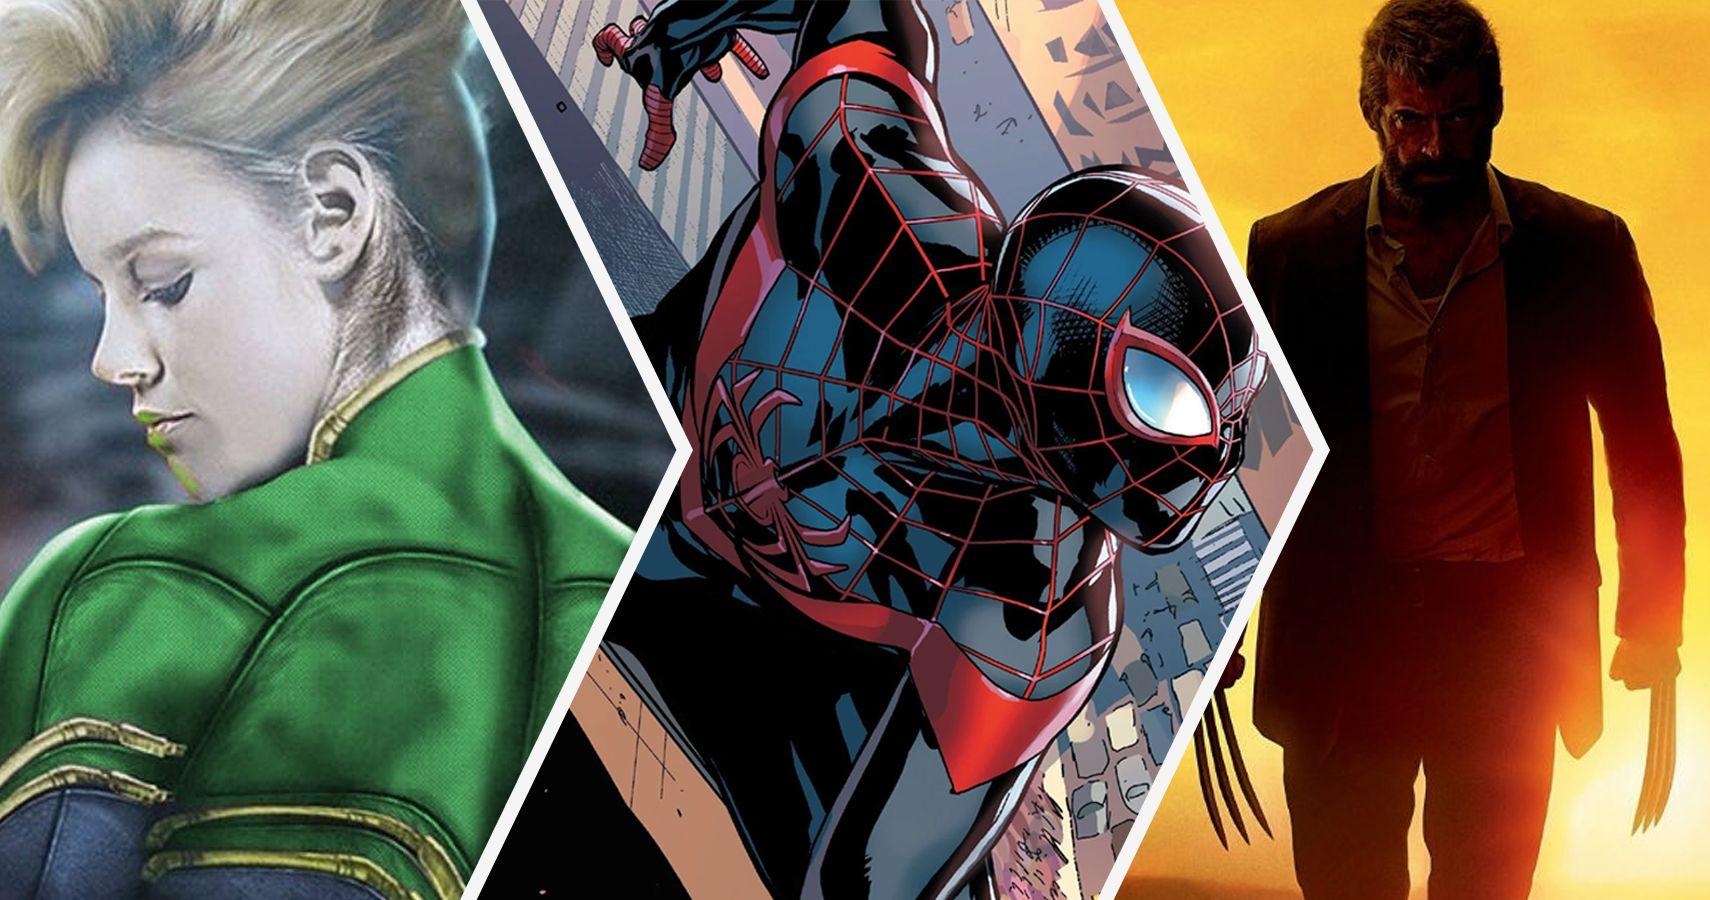 World of heroes superhero speed dating